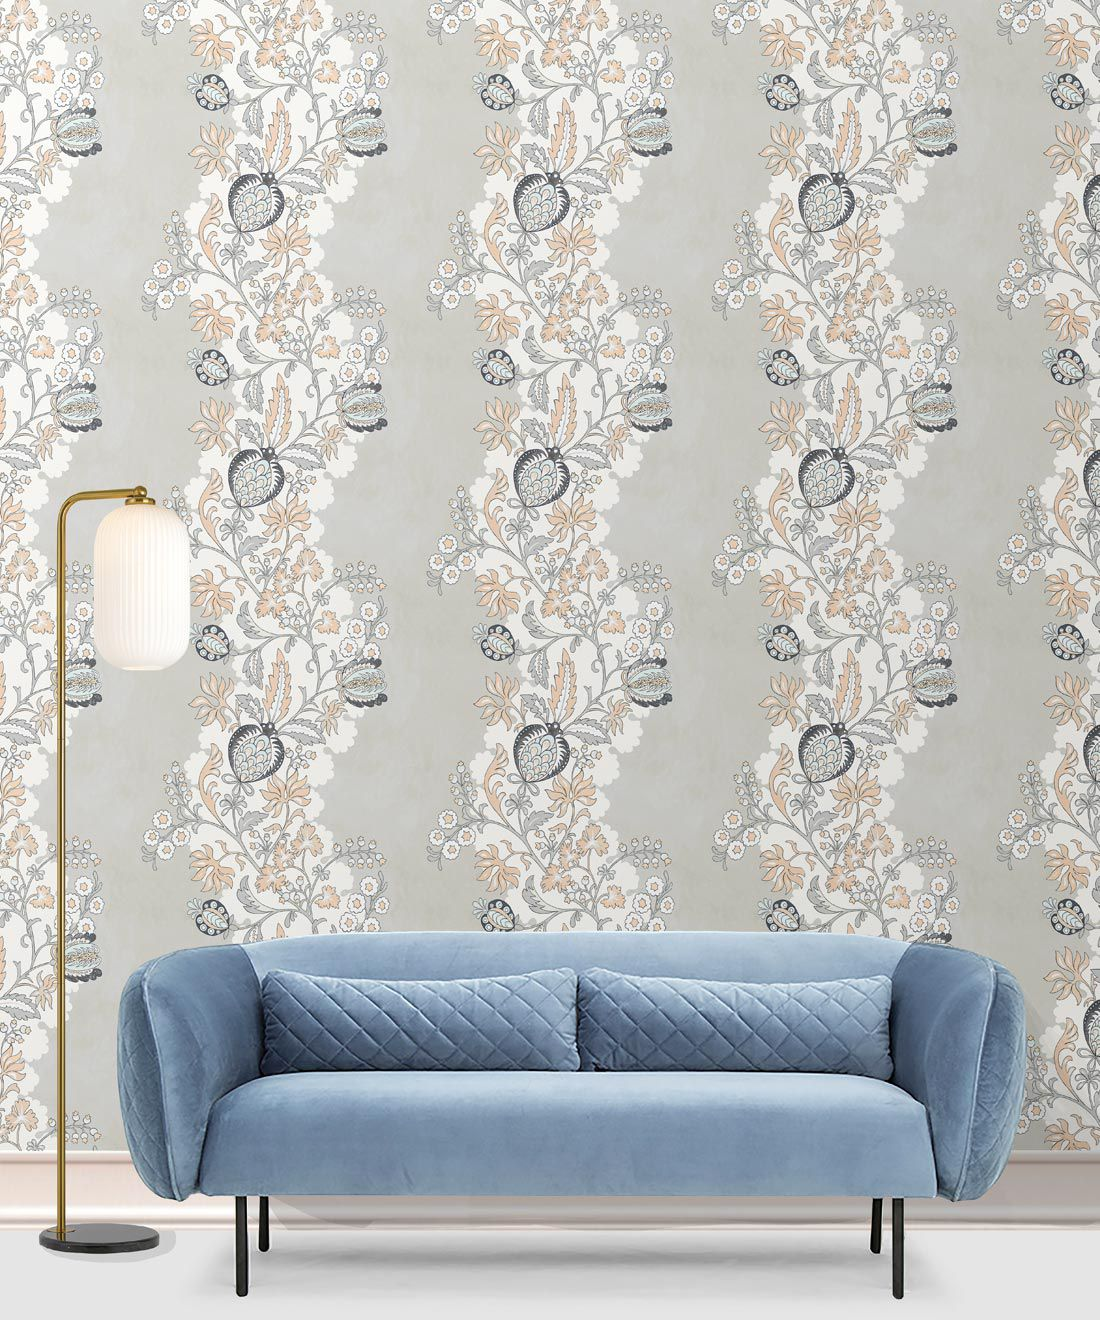 Pomegranate Wallpaper • salmon • insitu with a blue sofa